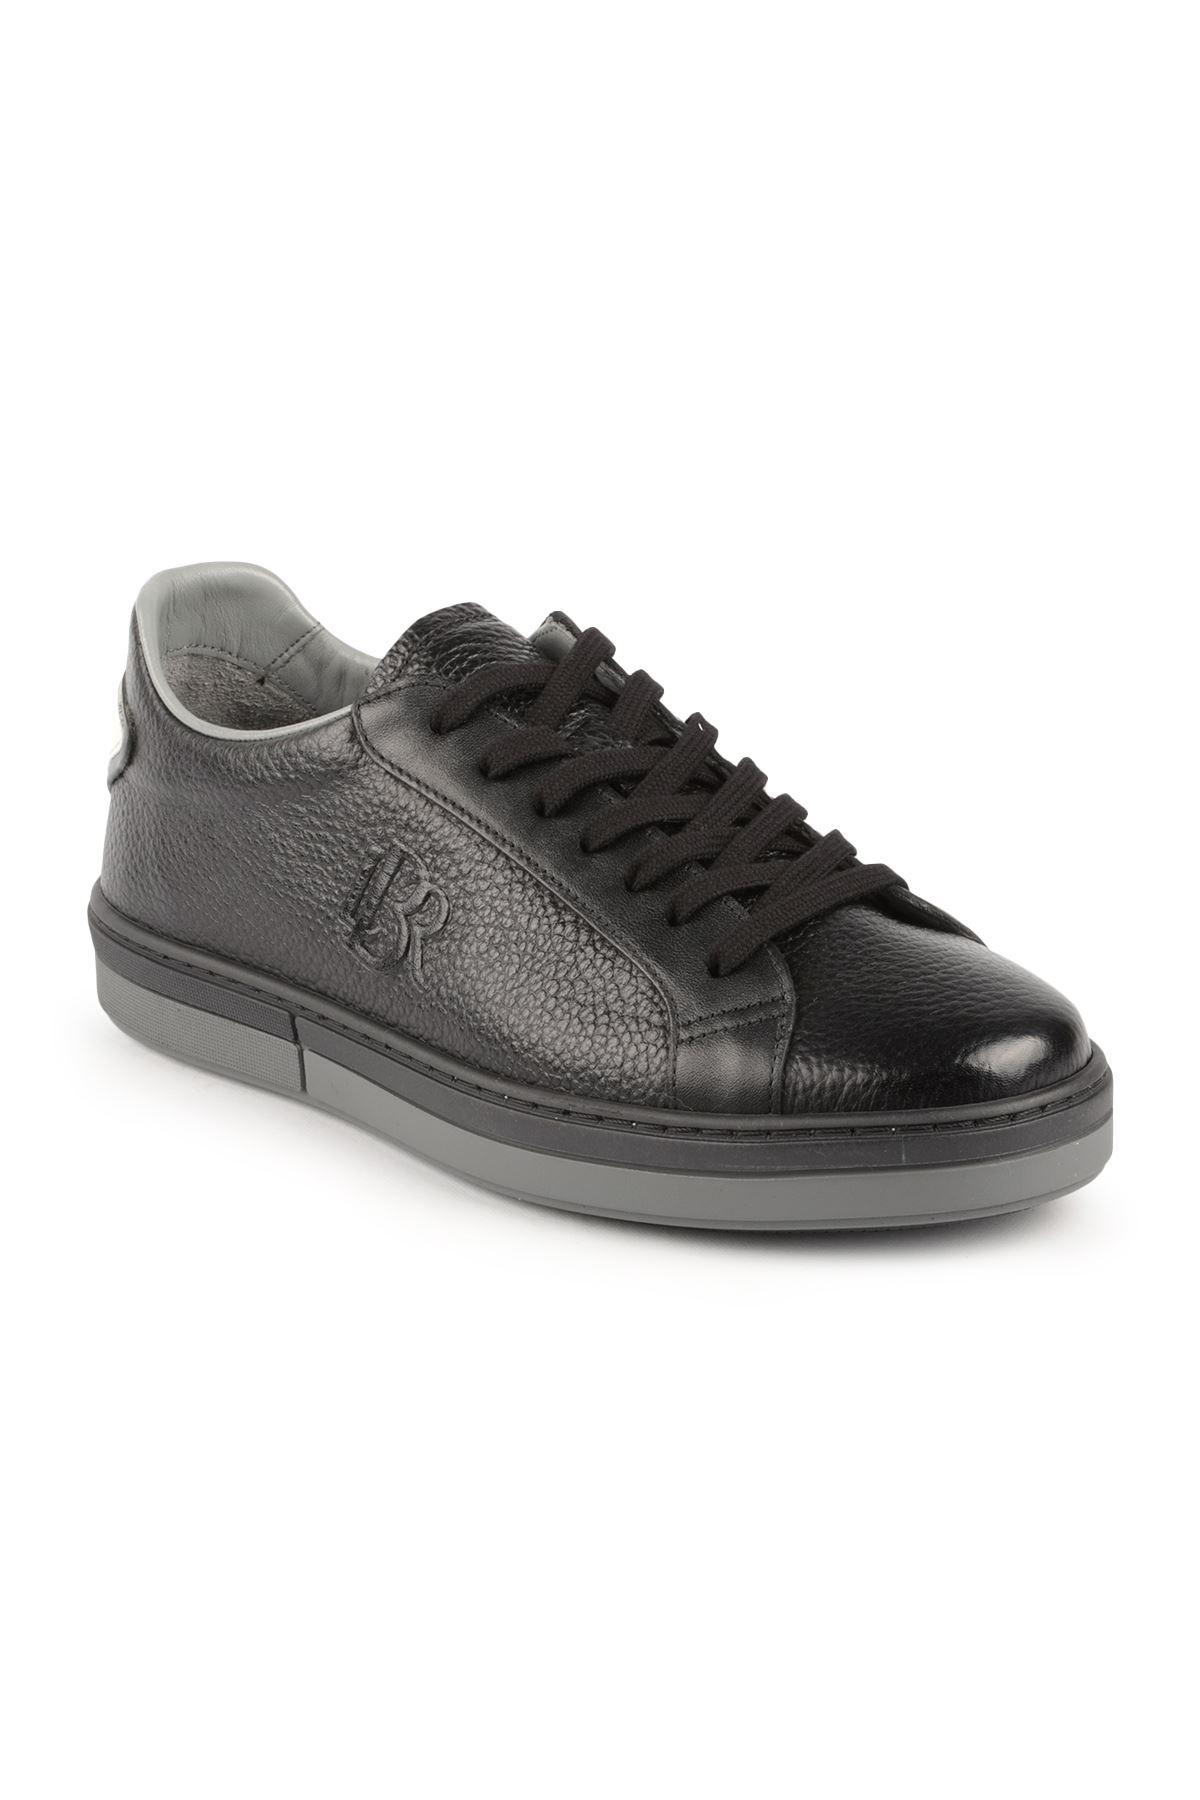 Libero L3355 Siyah Deri Spor Ayakkabı